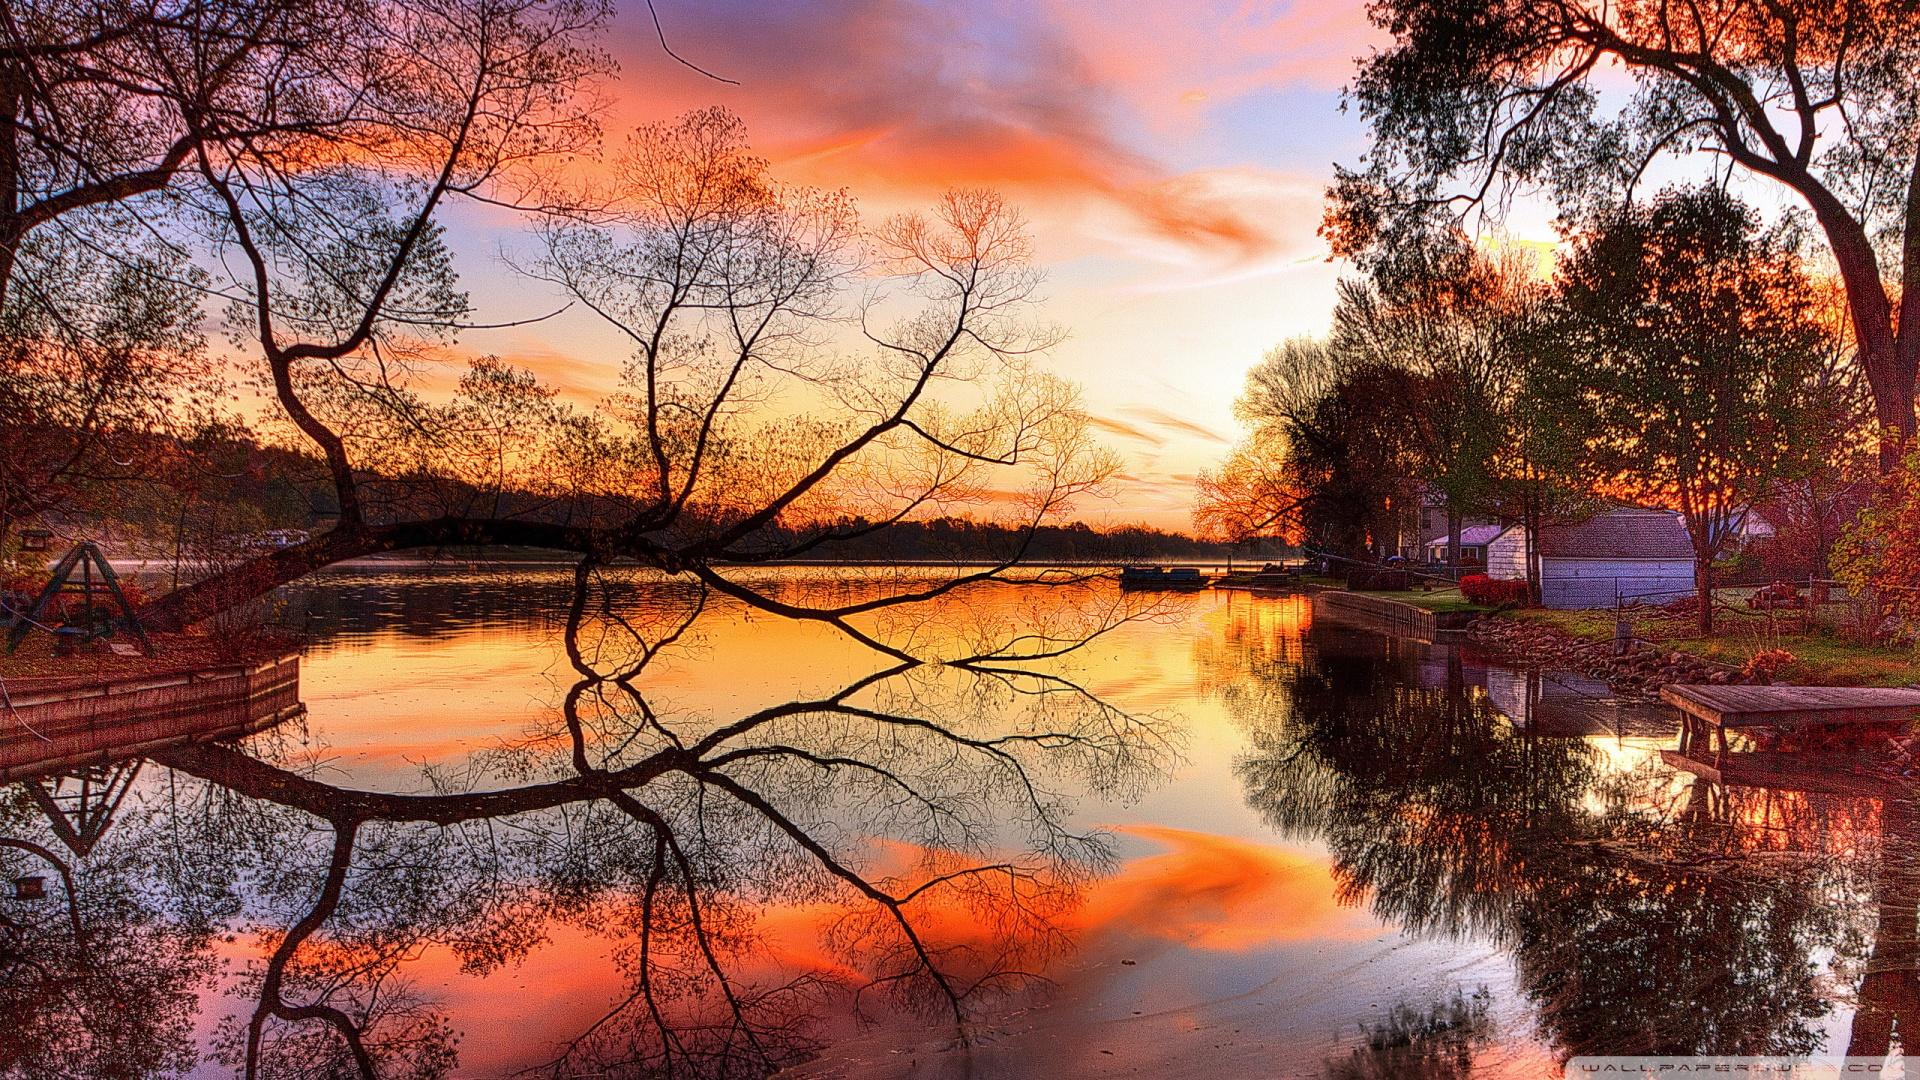 Pics Photos   Autumn Scenes Wallpaper Hd Download In 1920x1080